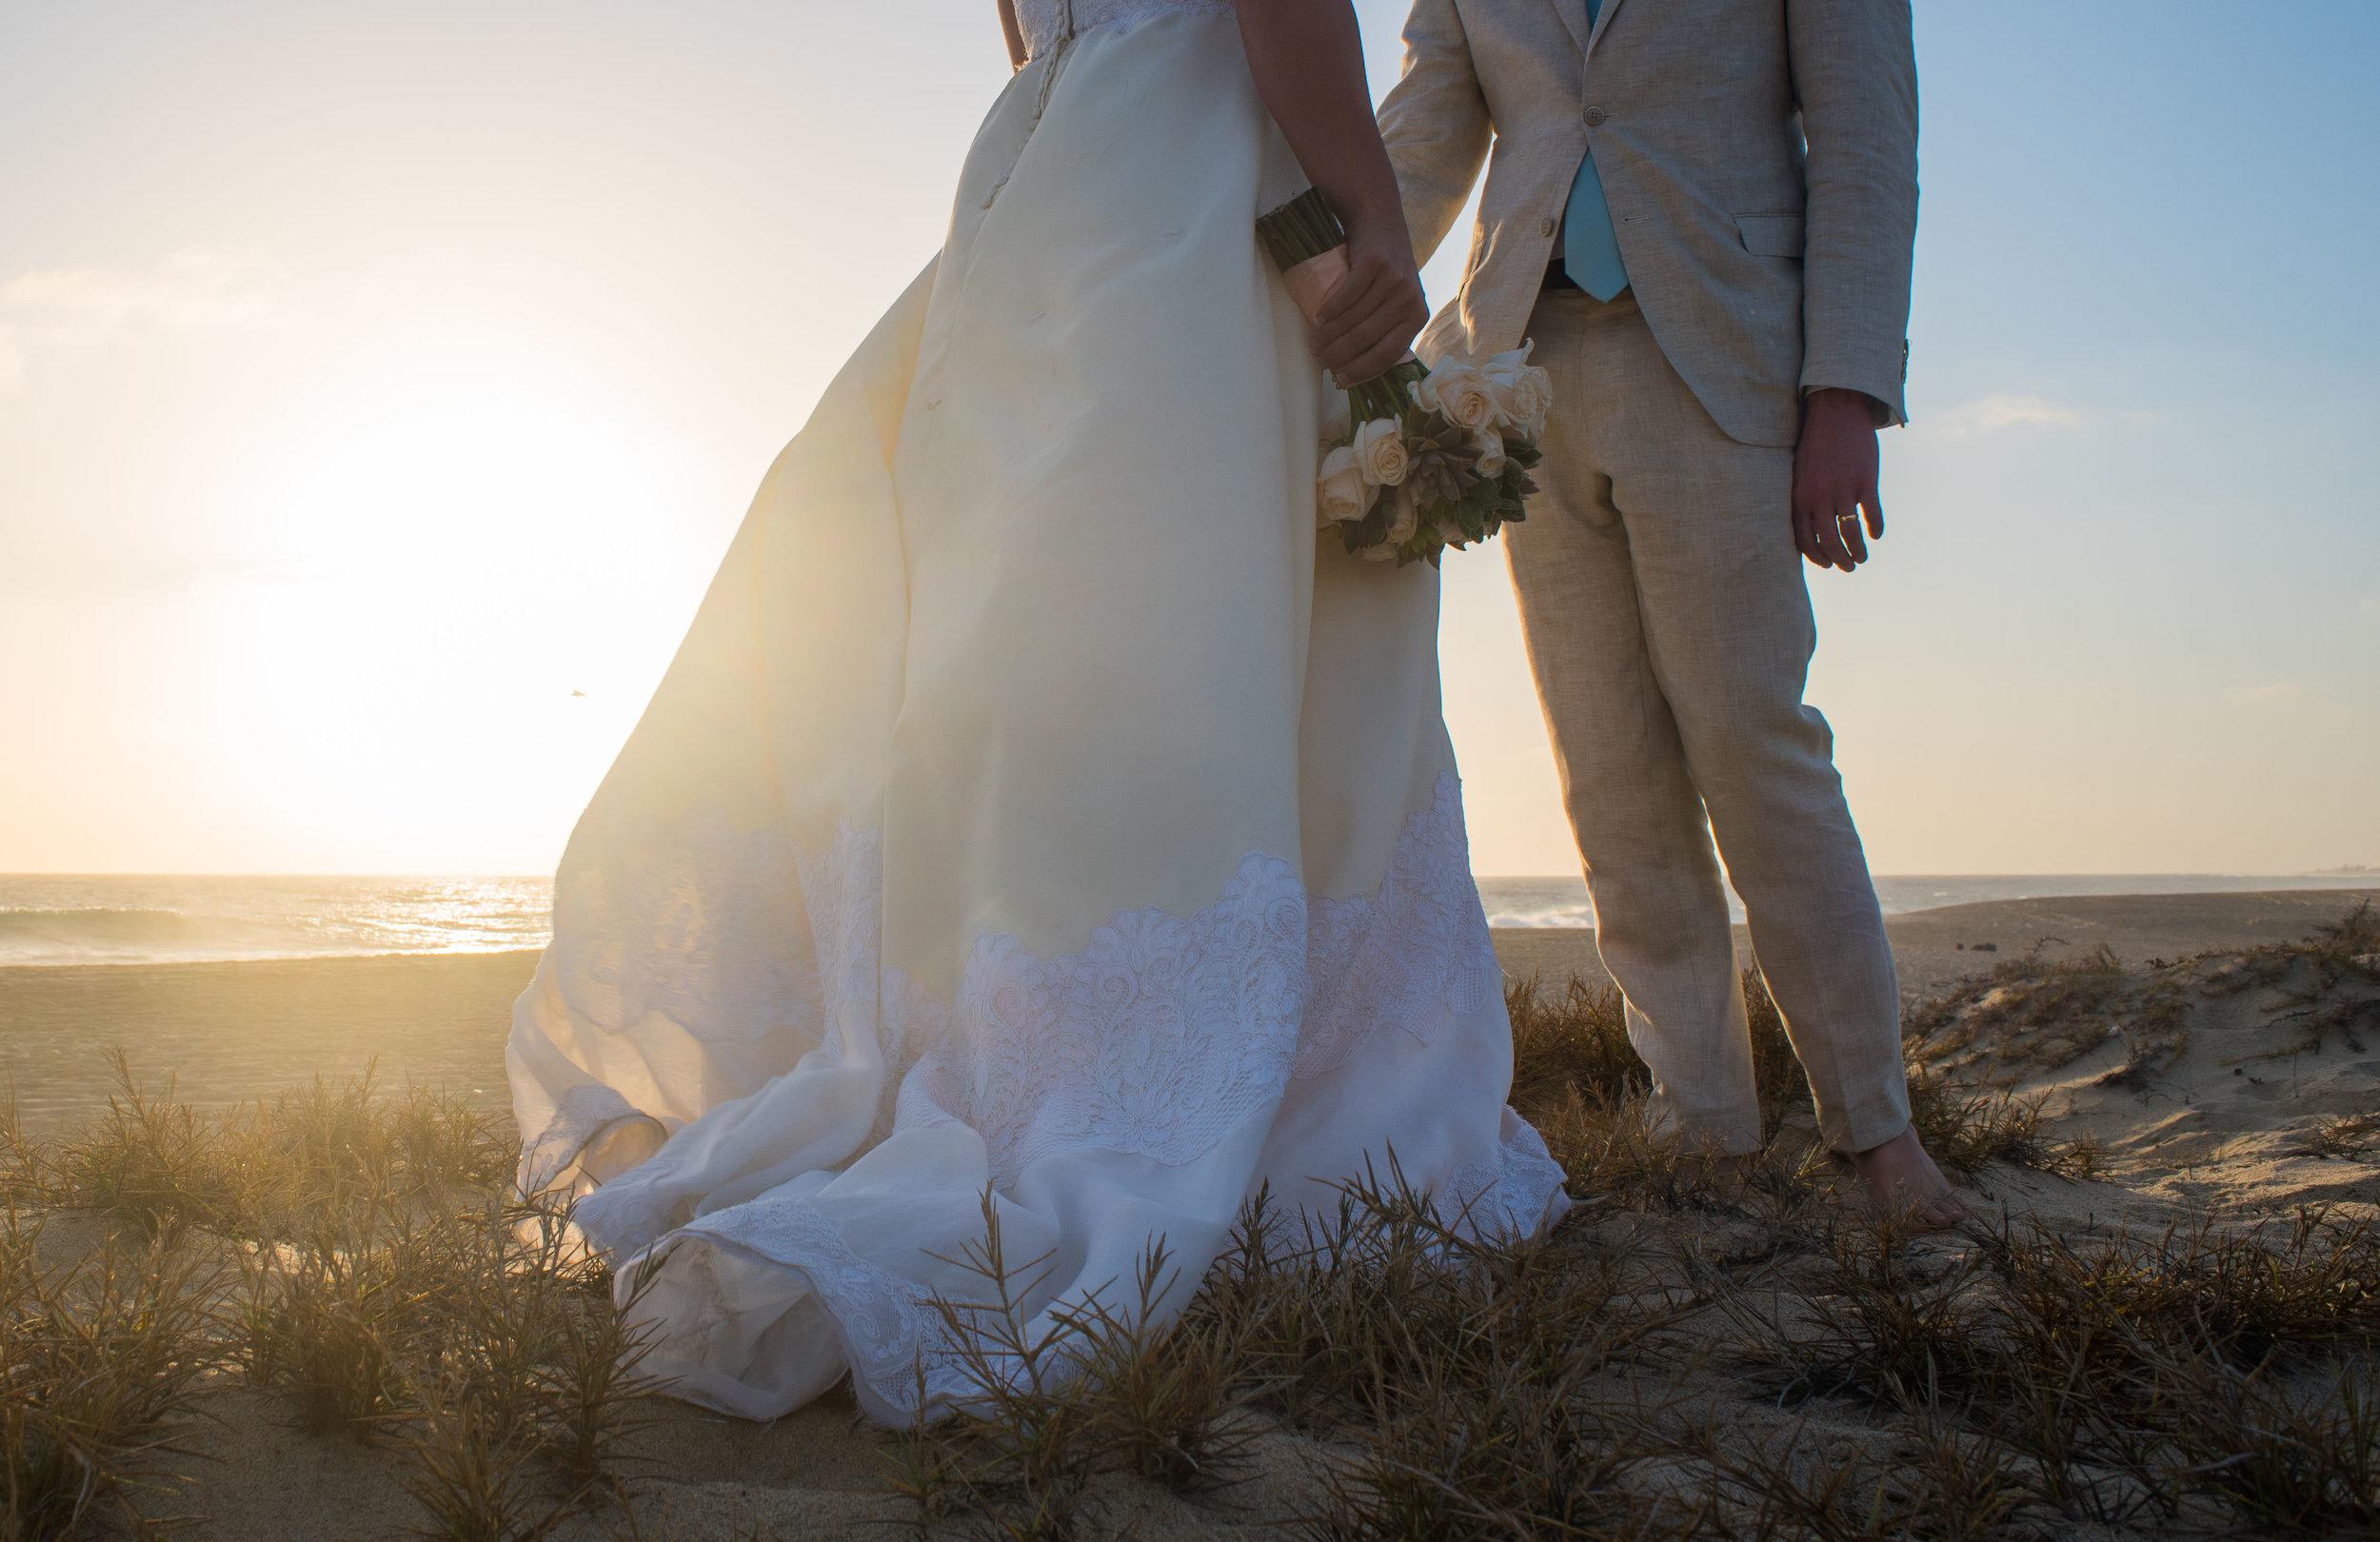 Sunset Session for a Todos Santos, Baja California bride and groom